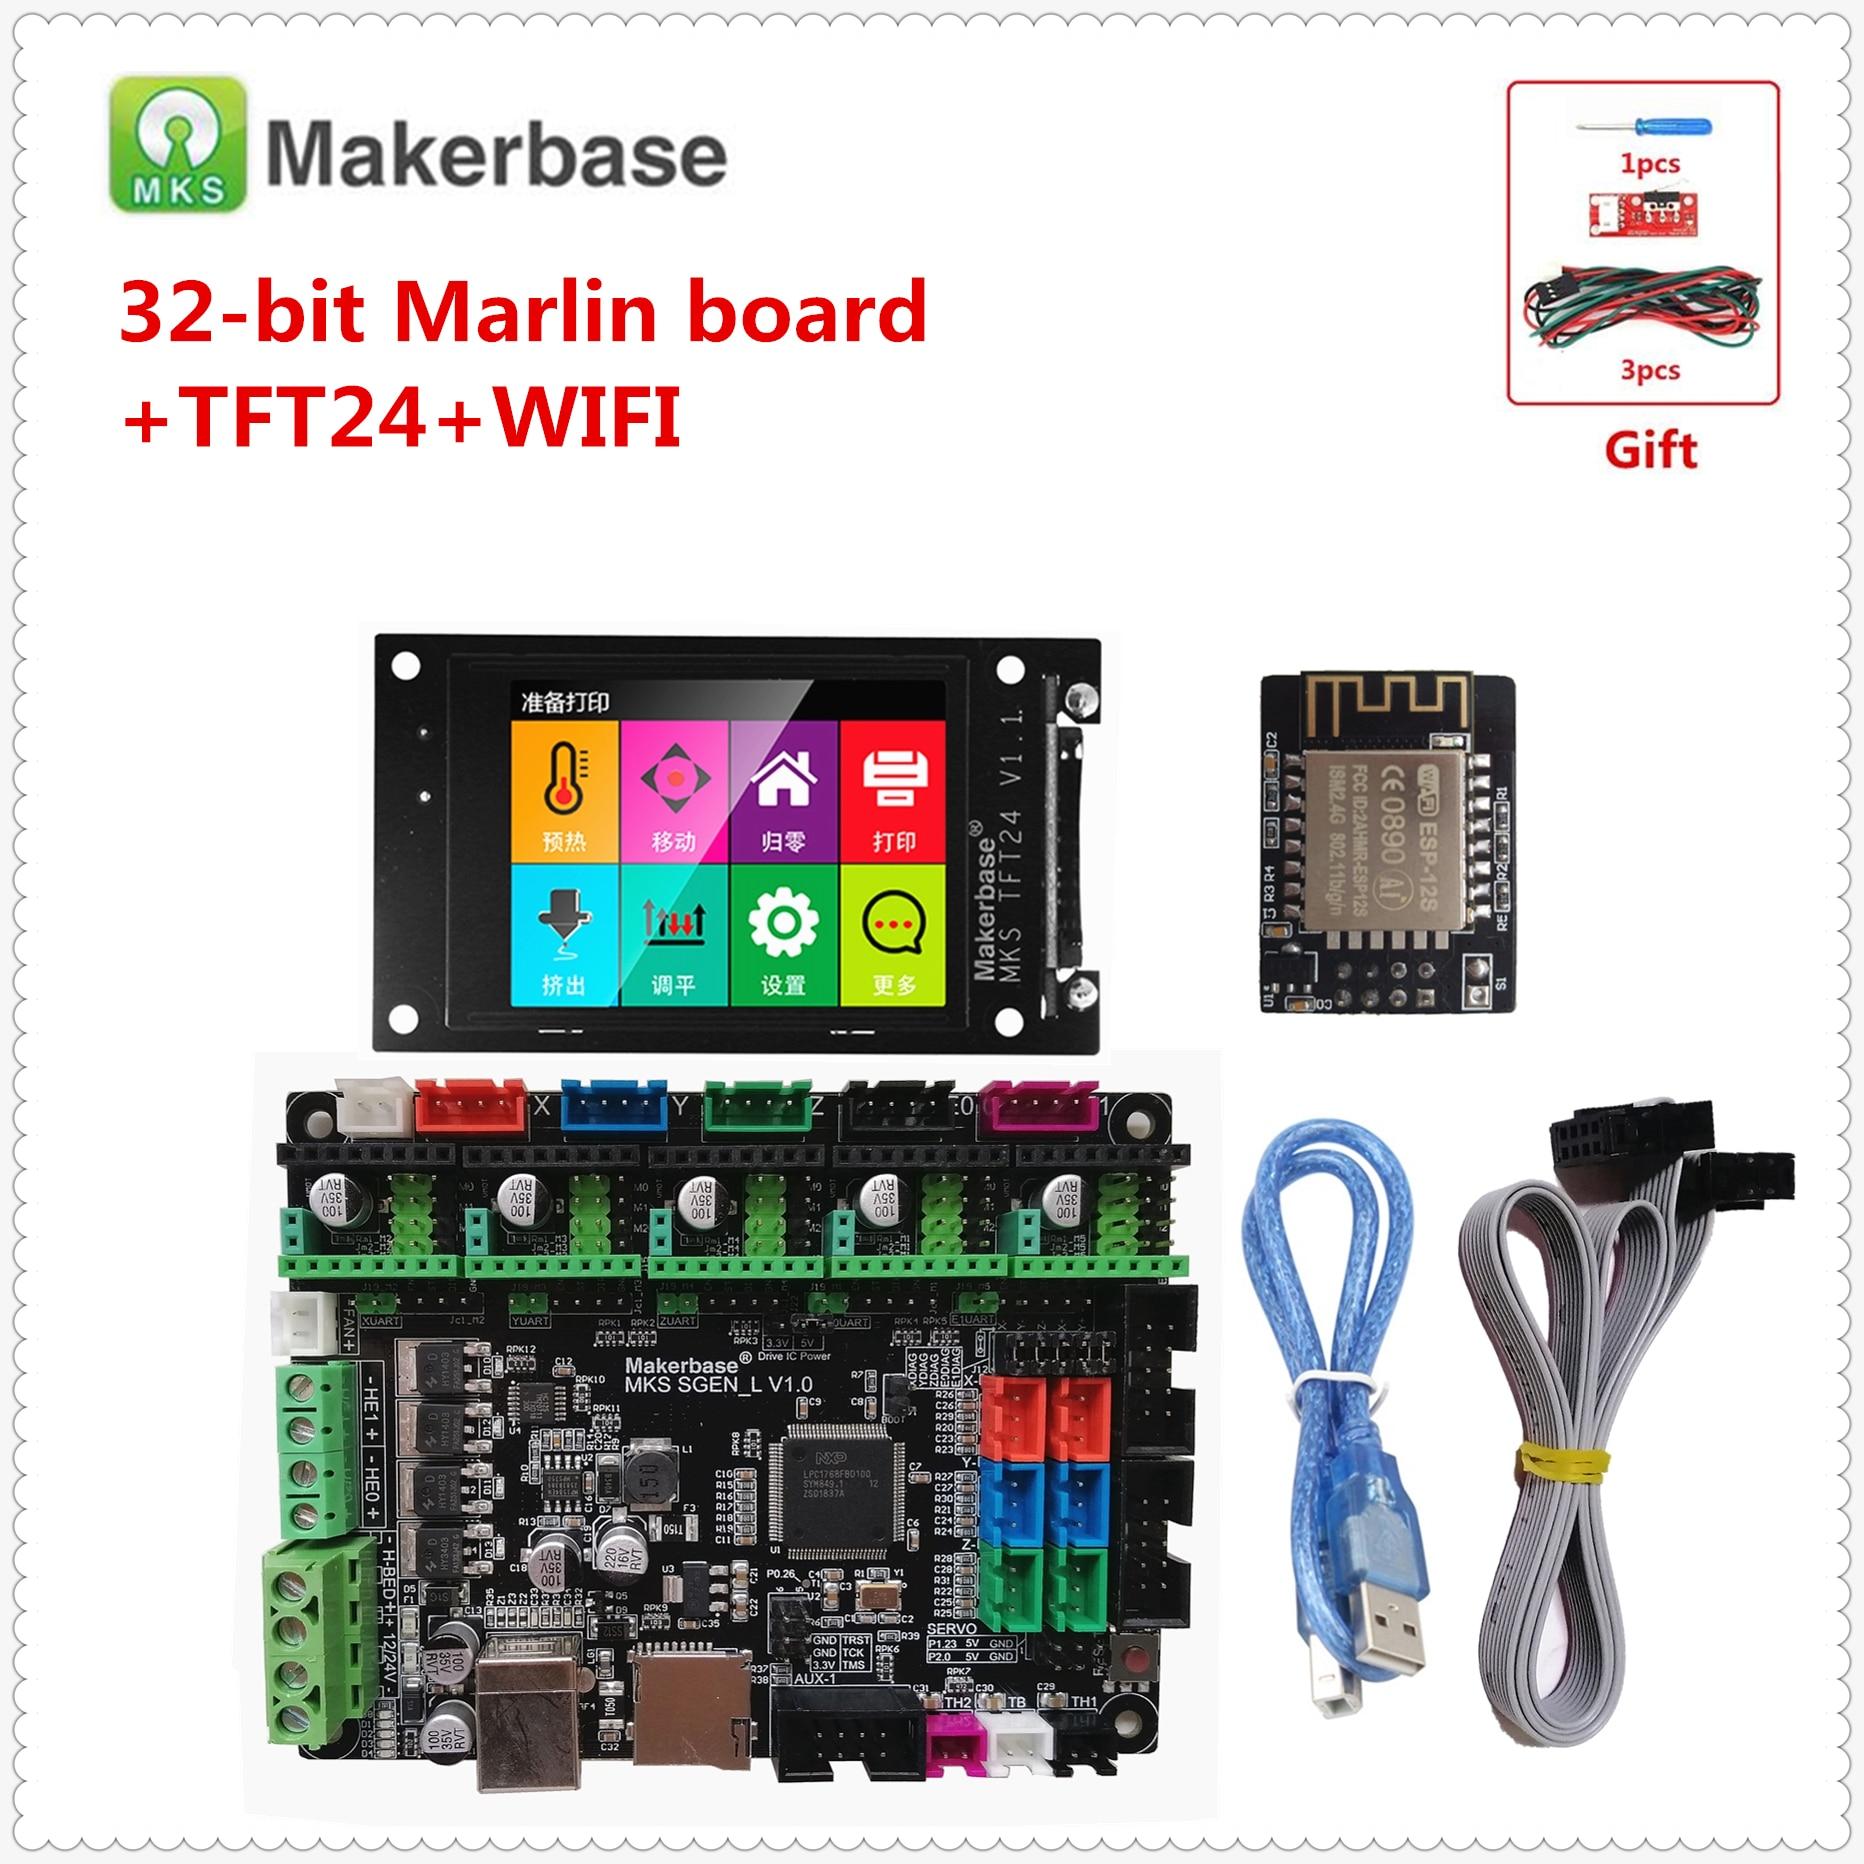 Best 3d Printer Upgrade Kits MKS SGEN L Smoothieboard + MKS TFT 24 Touch Screen + FiWi Monitor ARM 32 Bit 3d Printer Motherboard